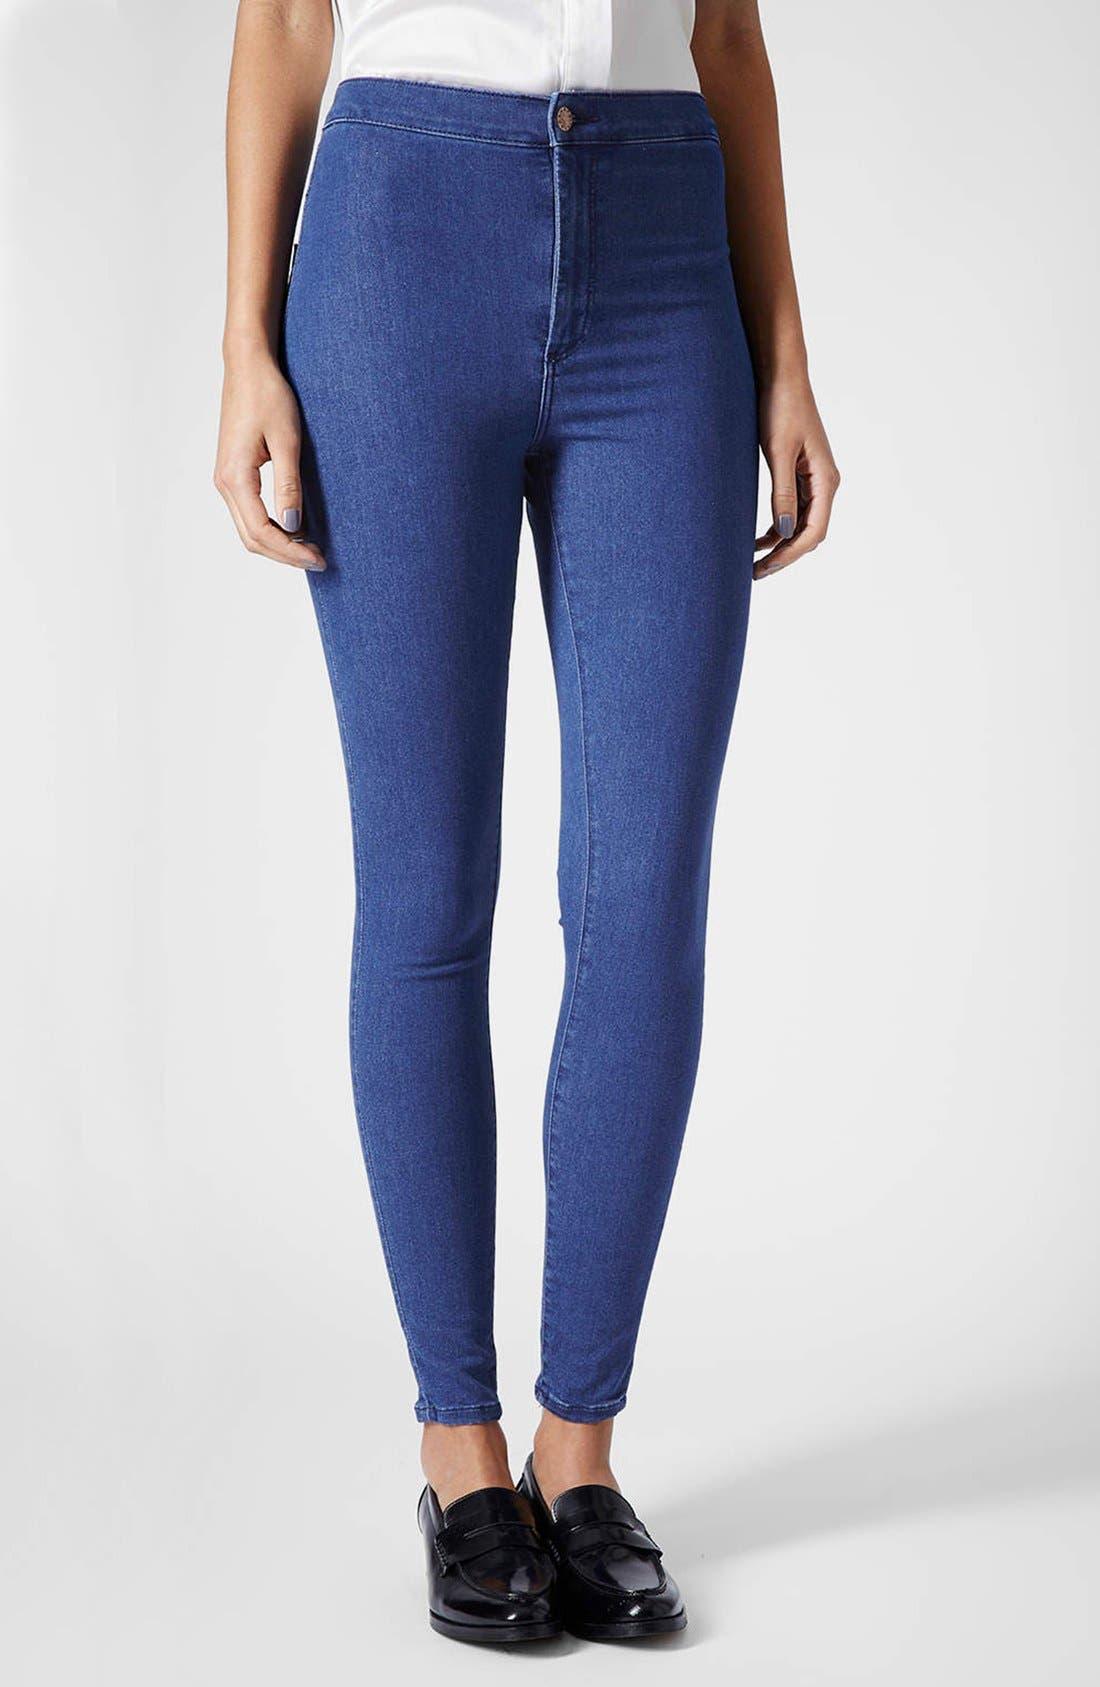 Main Image - Topshop Moto 'Joni' High Rise Skinny Jeans (Regular, Short & Long) (Blue)